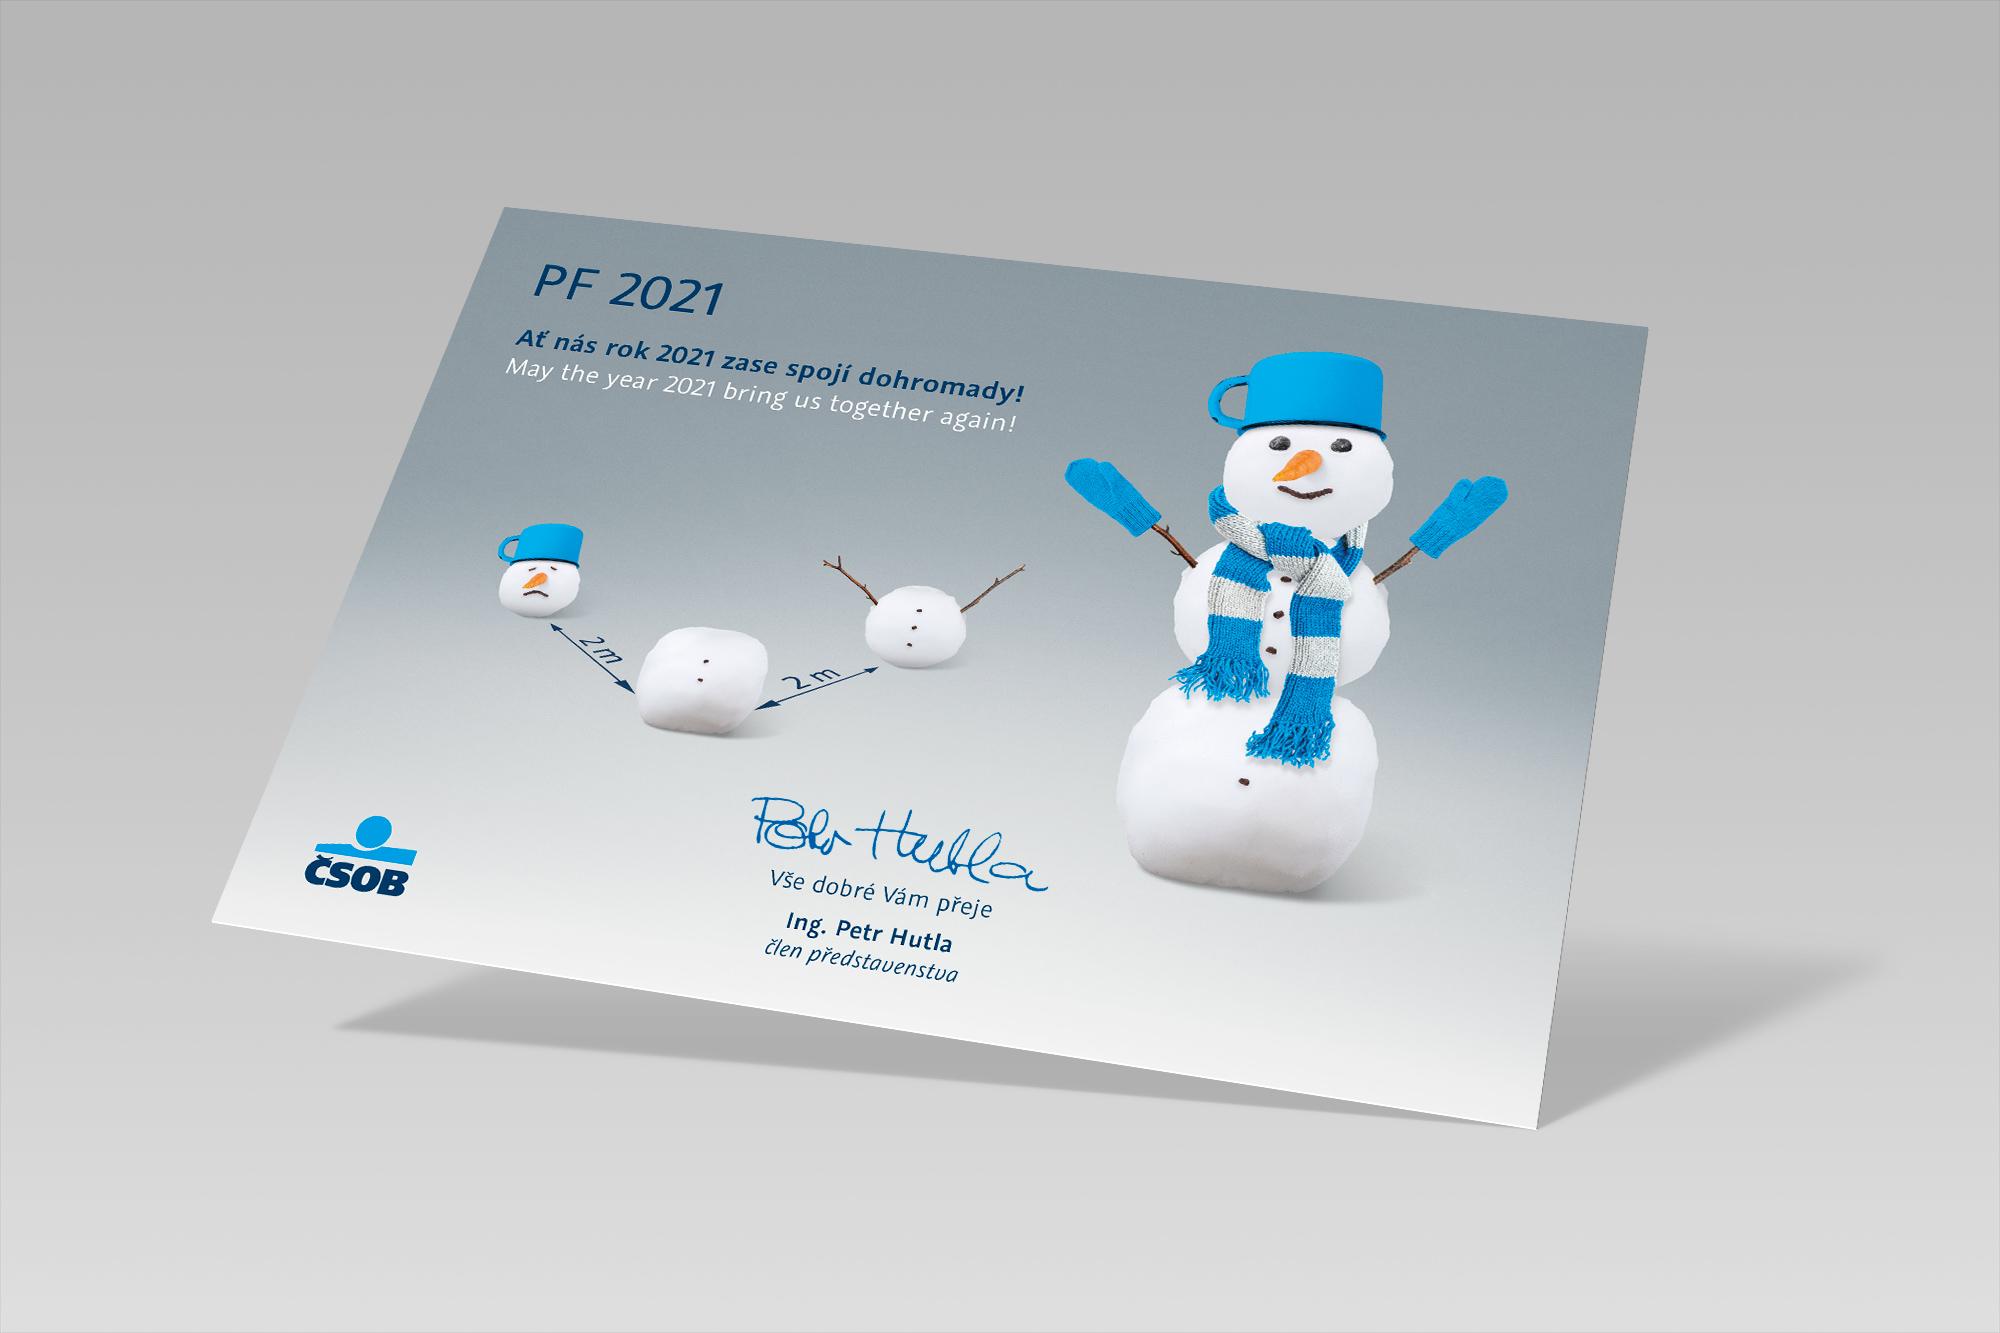 [album/Products_Model_Product/131/PF2021_snehulak_tistene_2.jpg]